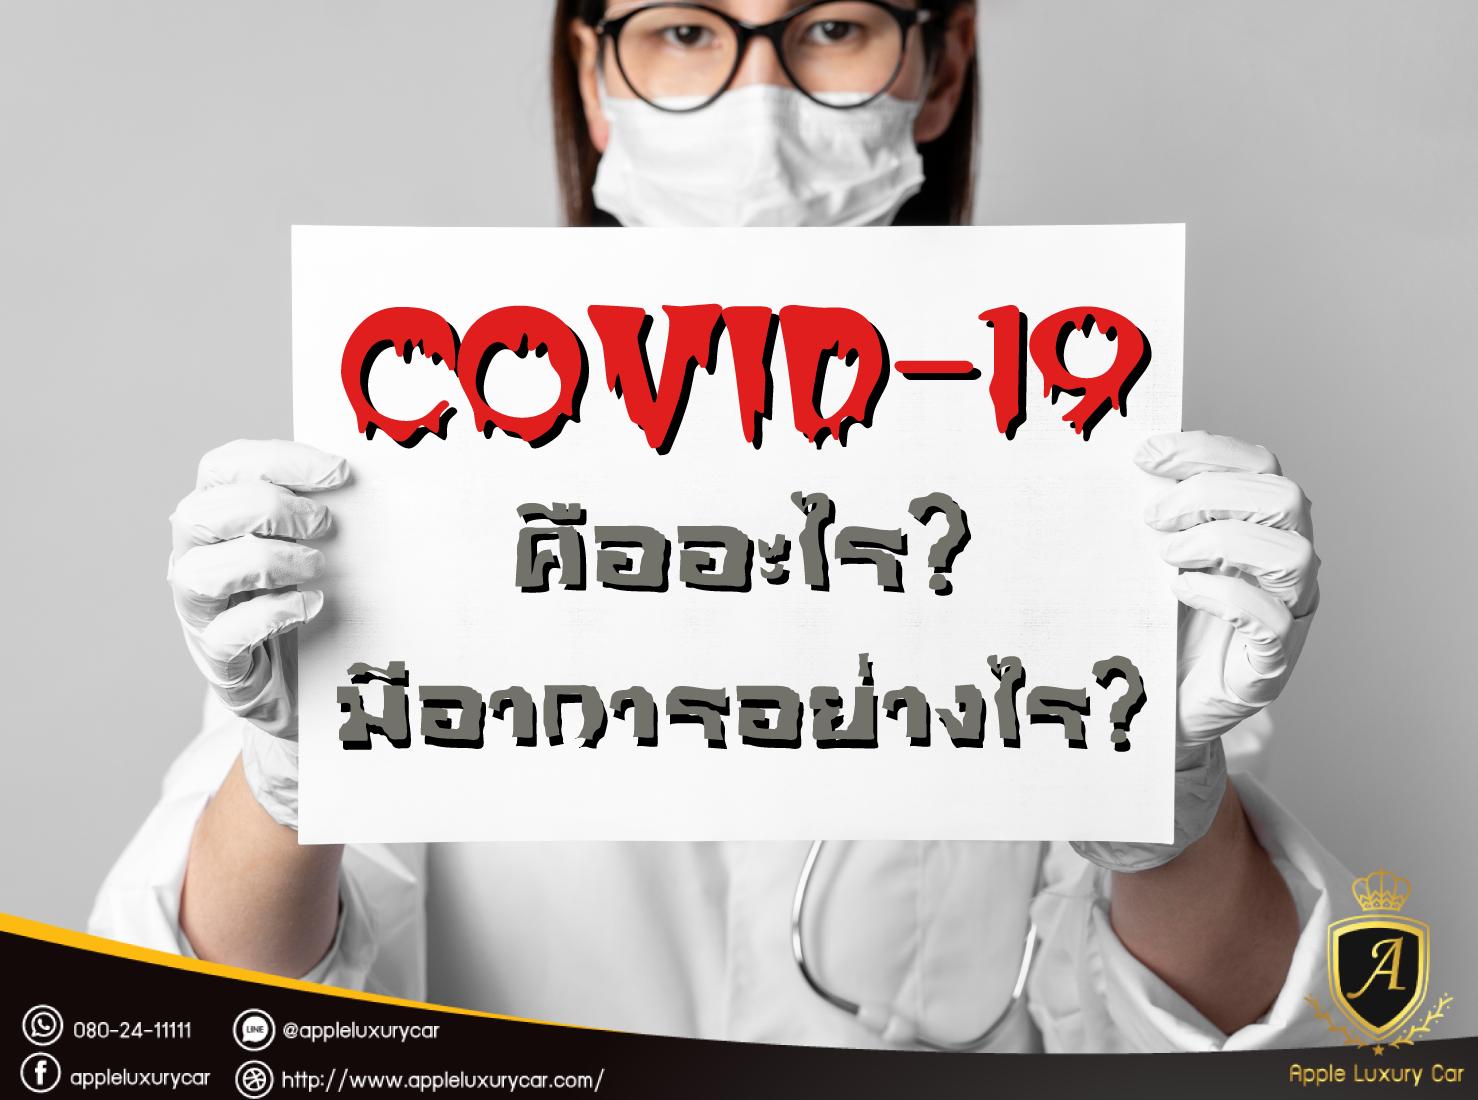 covid-19 อาการอย่างไร